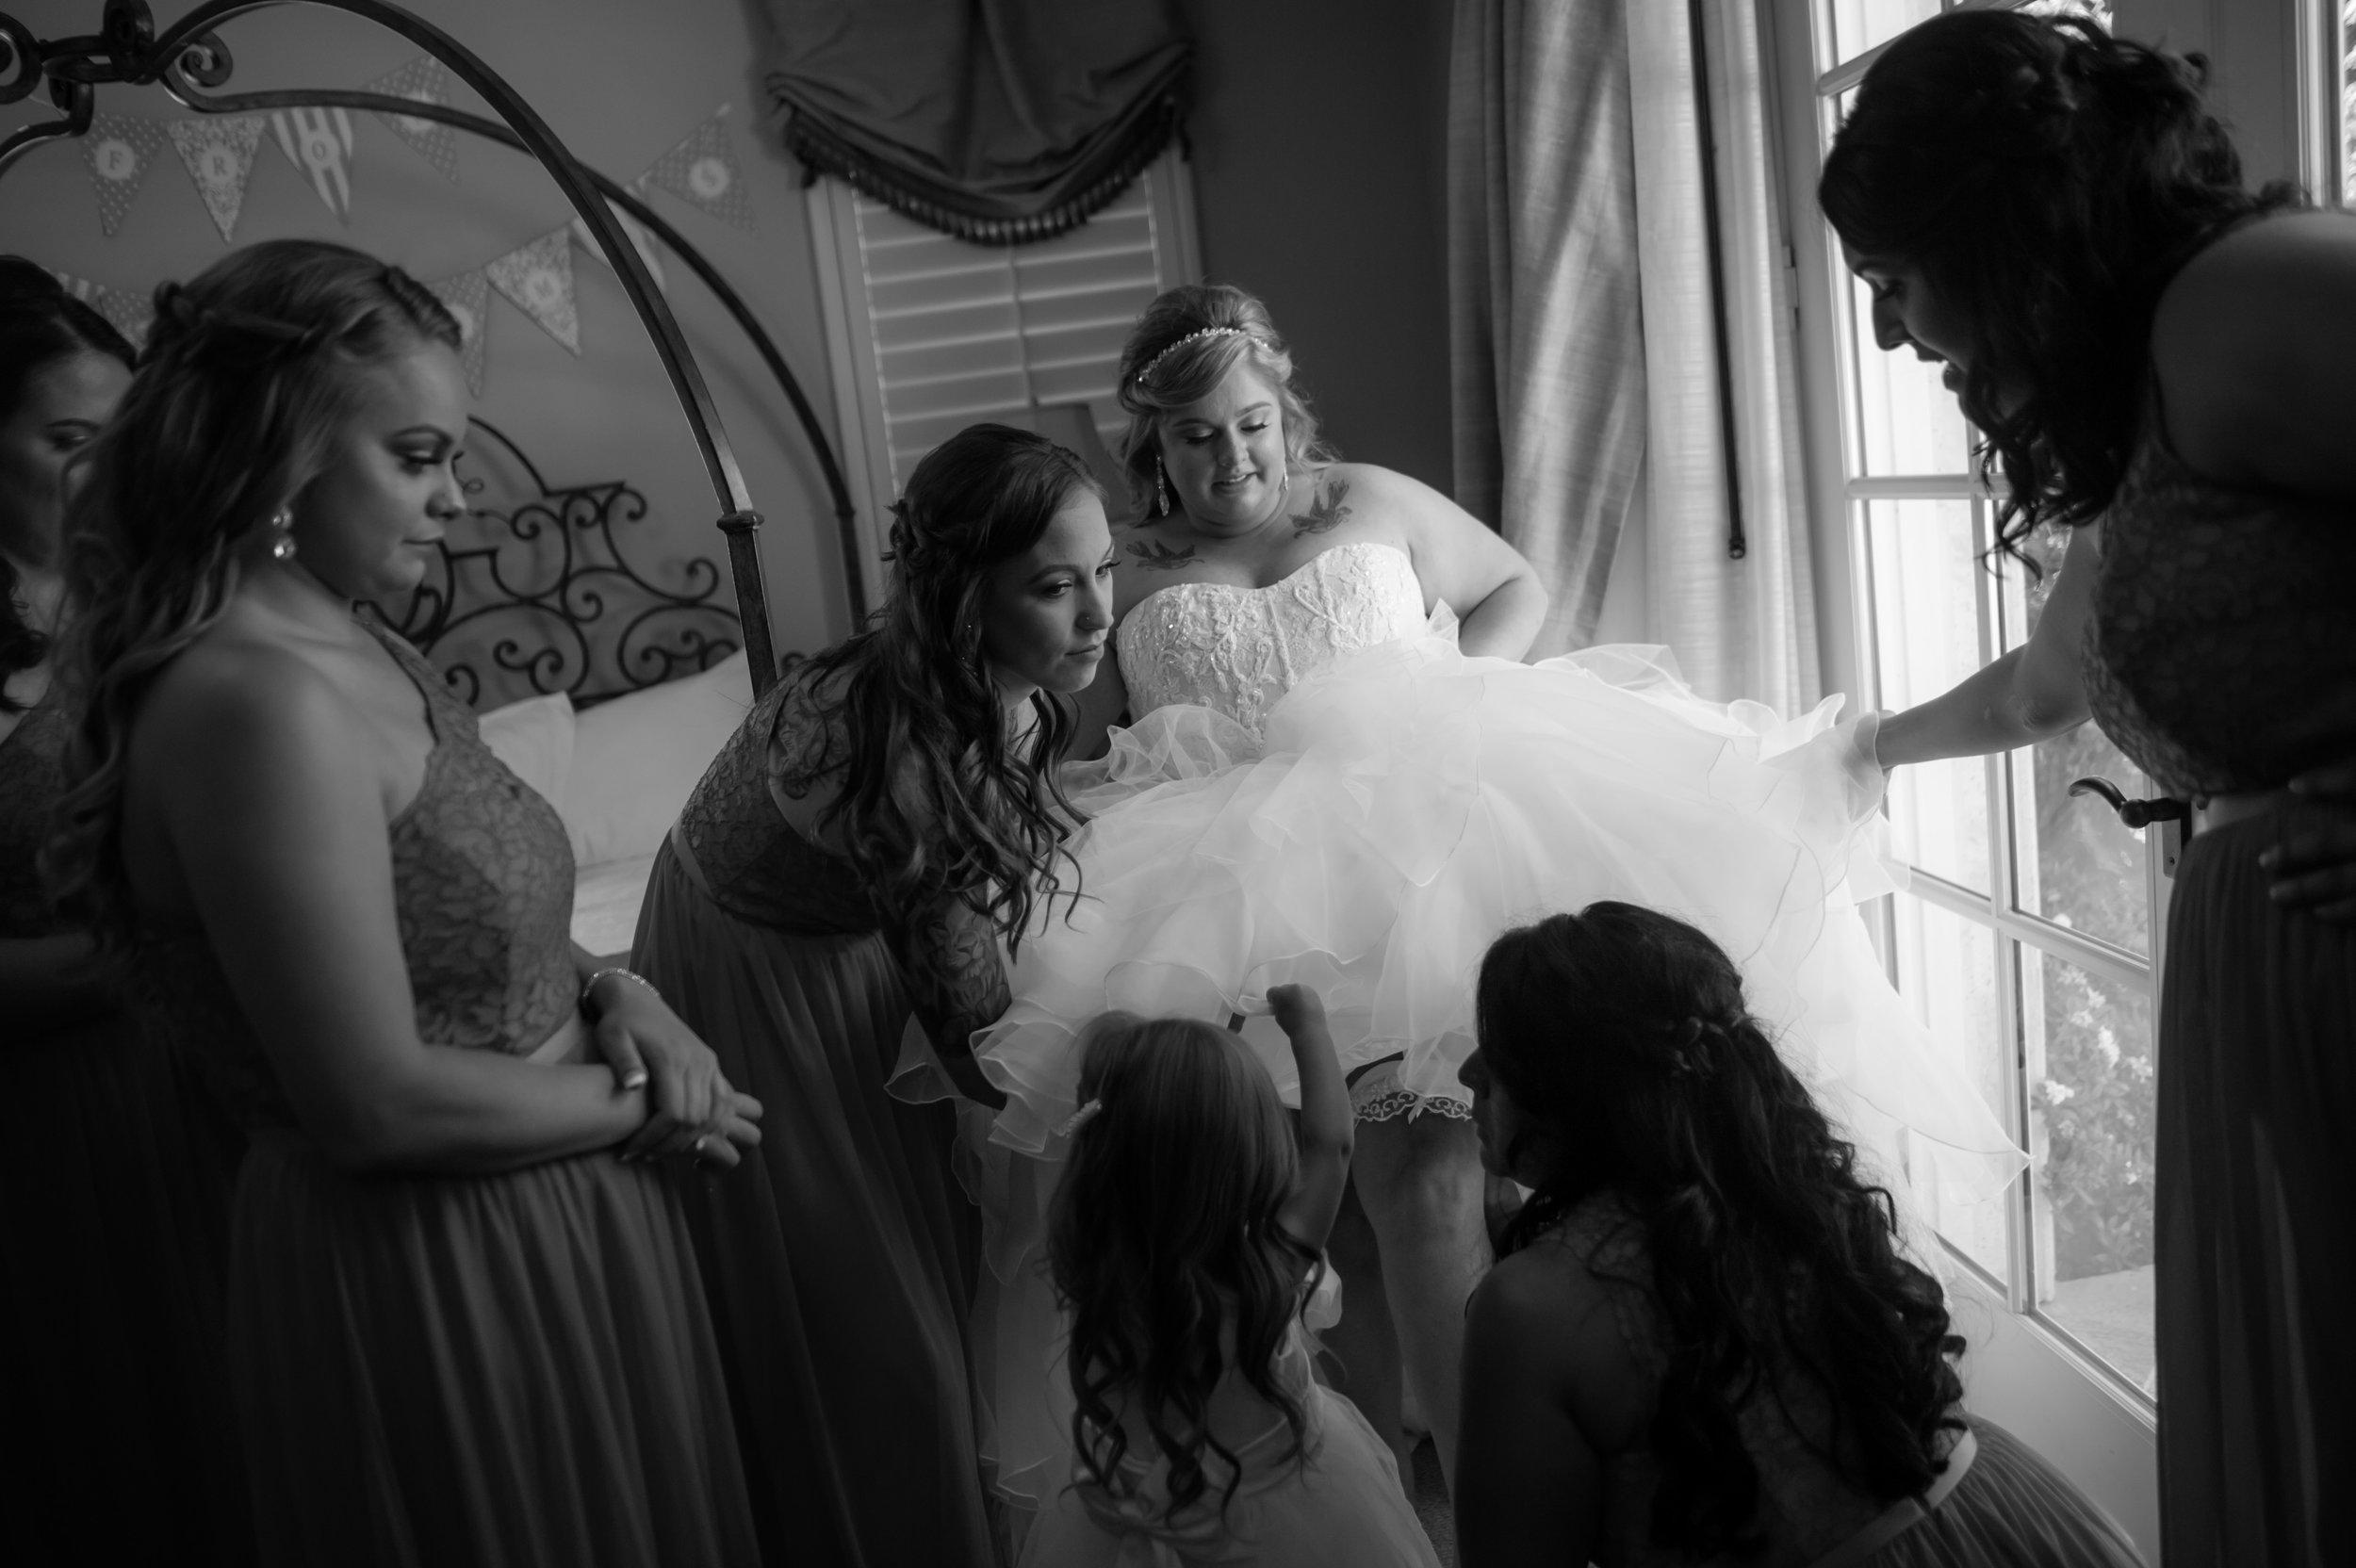 lyndzie-javier-010-arden-hills-sacramento-wedding-photographer-katherine-nicole-photography.JPG